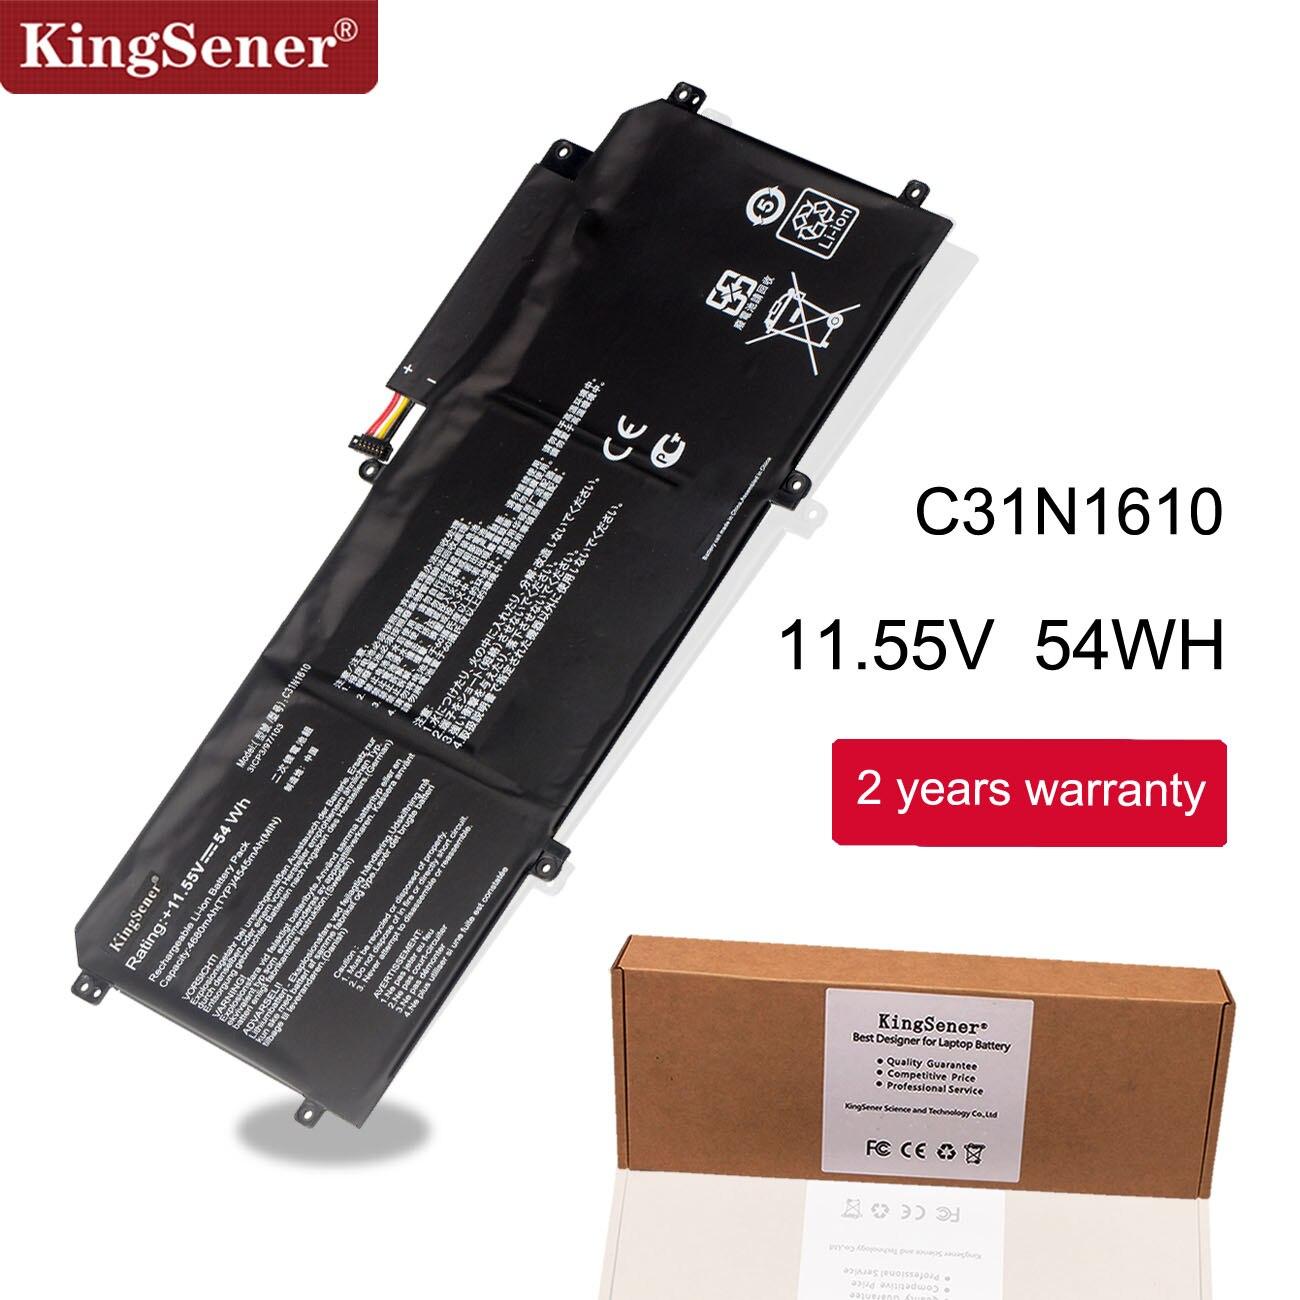 Kingsener C31N1610 Battery For ASUS ZenBook UX330C UX330CA U3000C UX330CA-1C 1A UX330CA-FC009T FC020T FC030T 0B200-02090100